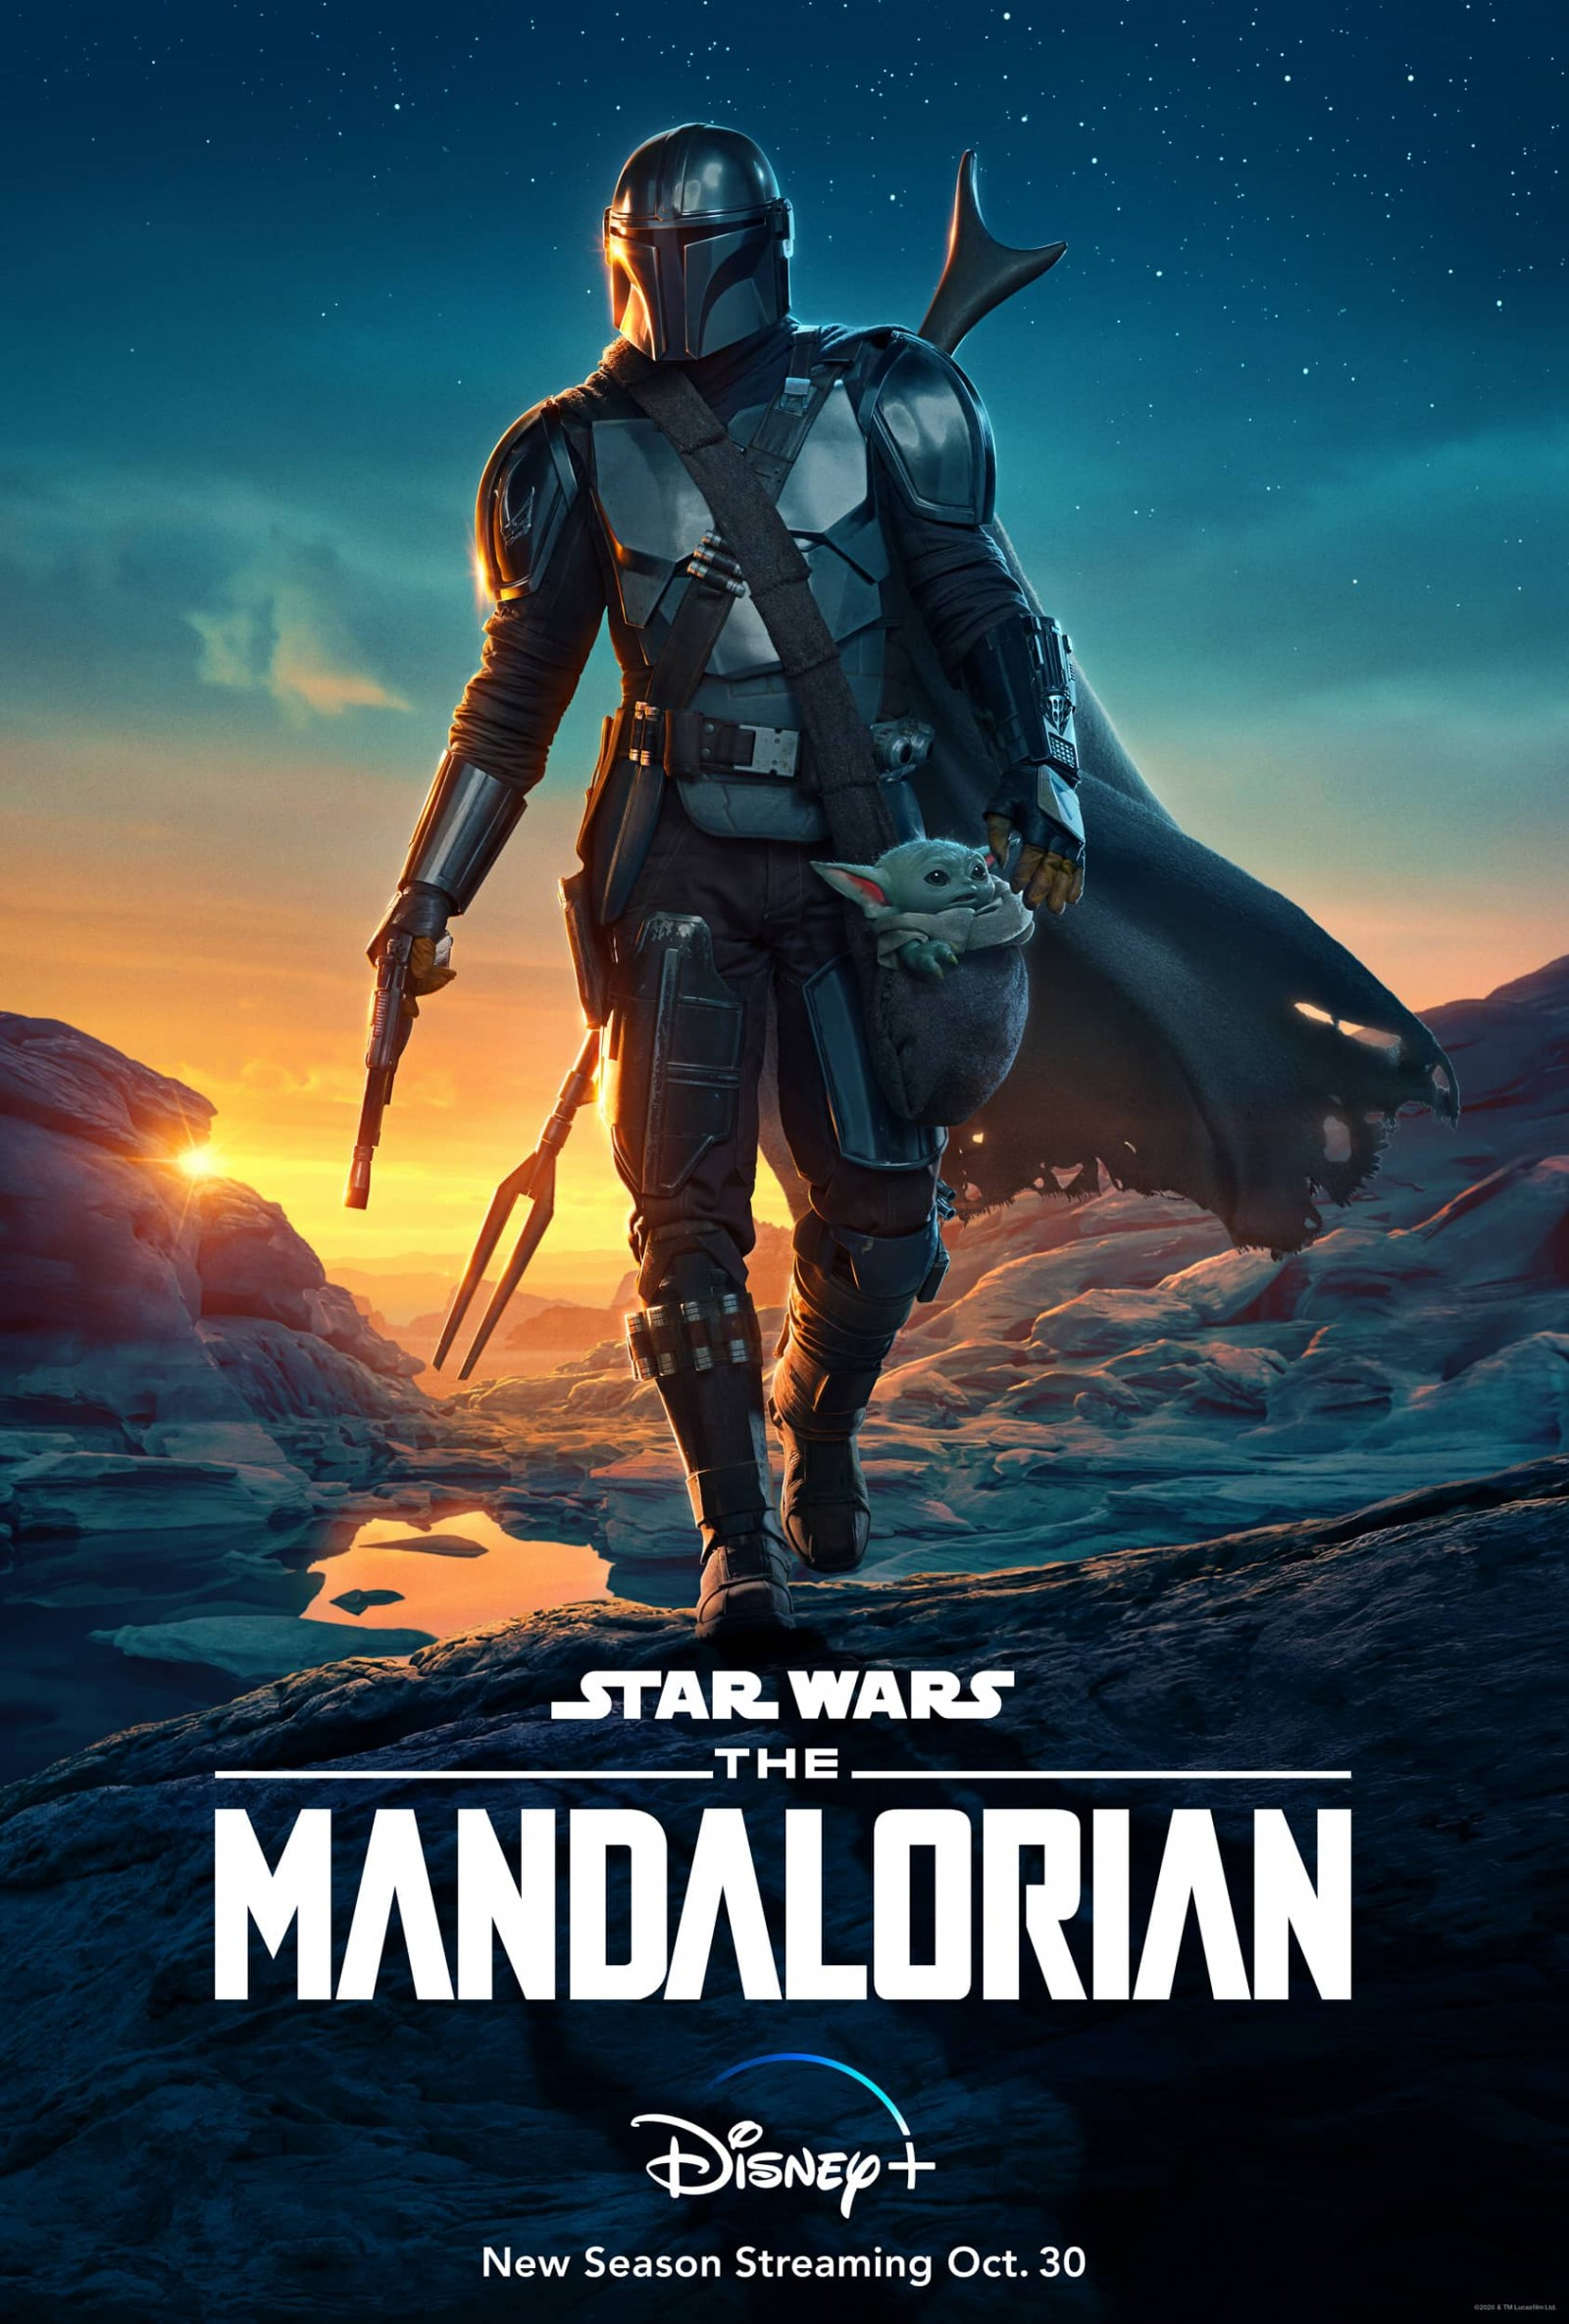 The Mandalorian Season Two Poster Key Art